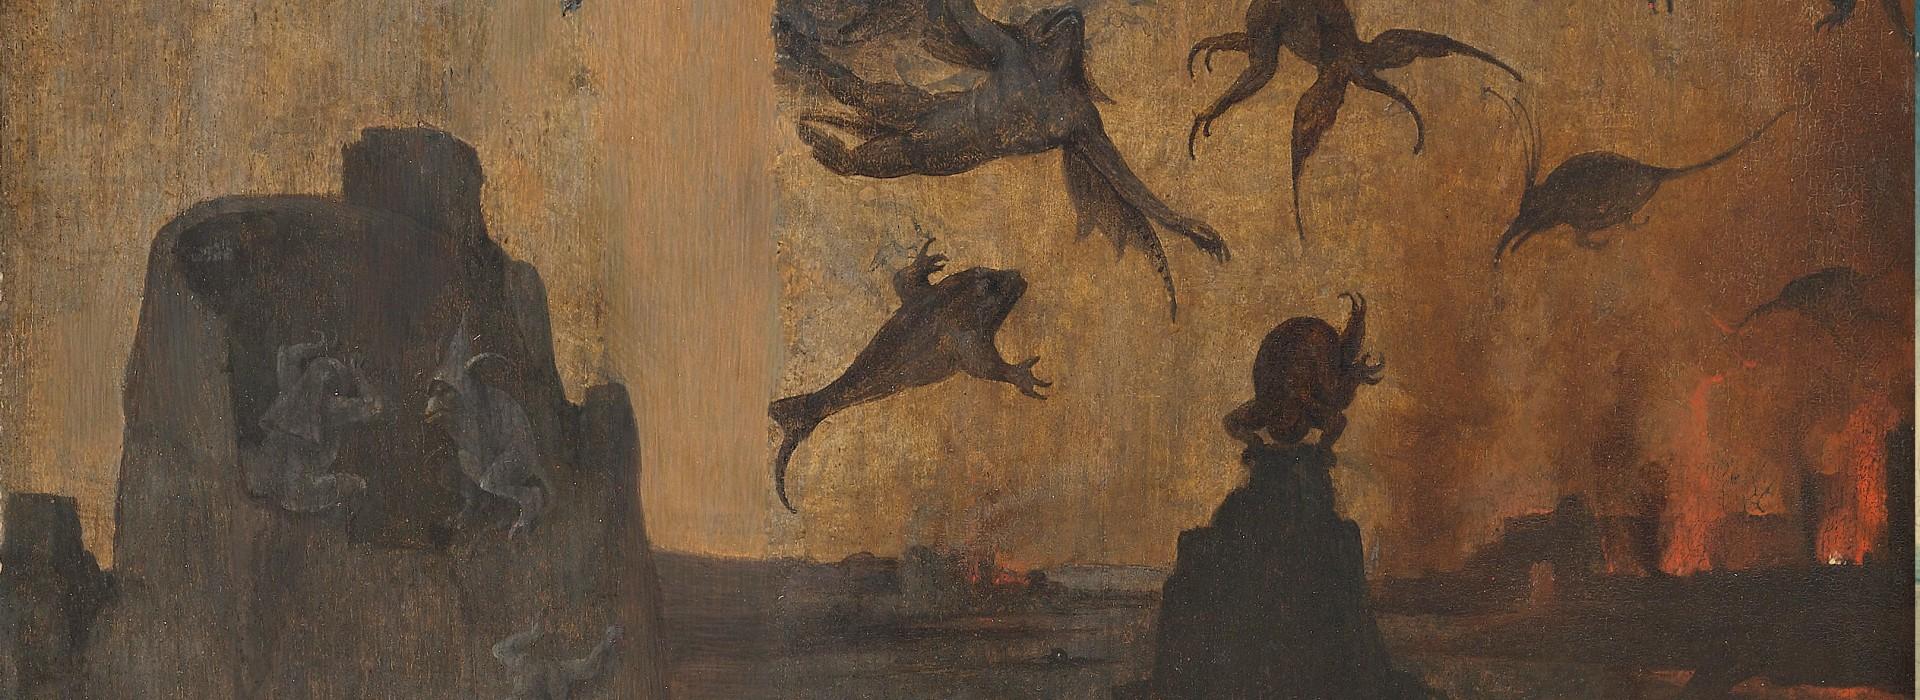 Jheronimus Bosch De Duivelmaker Museum Boijmans Van